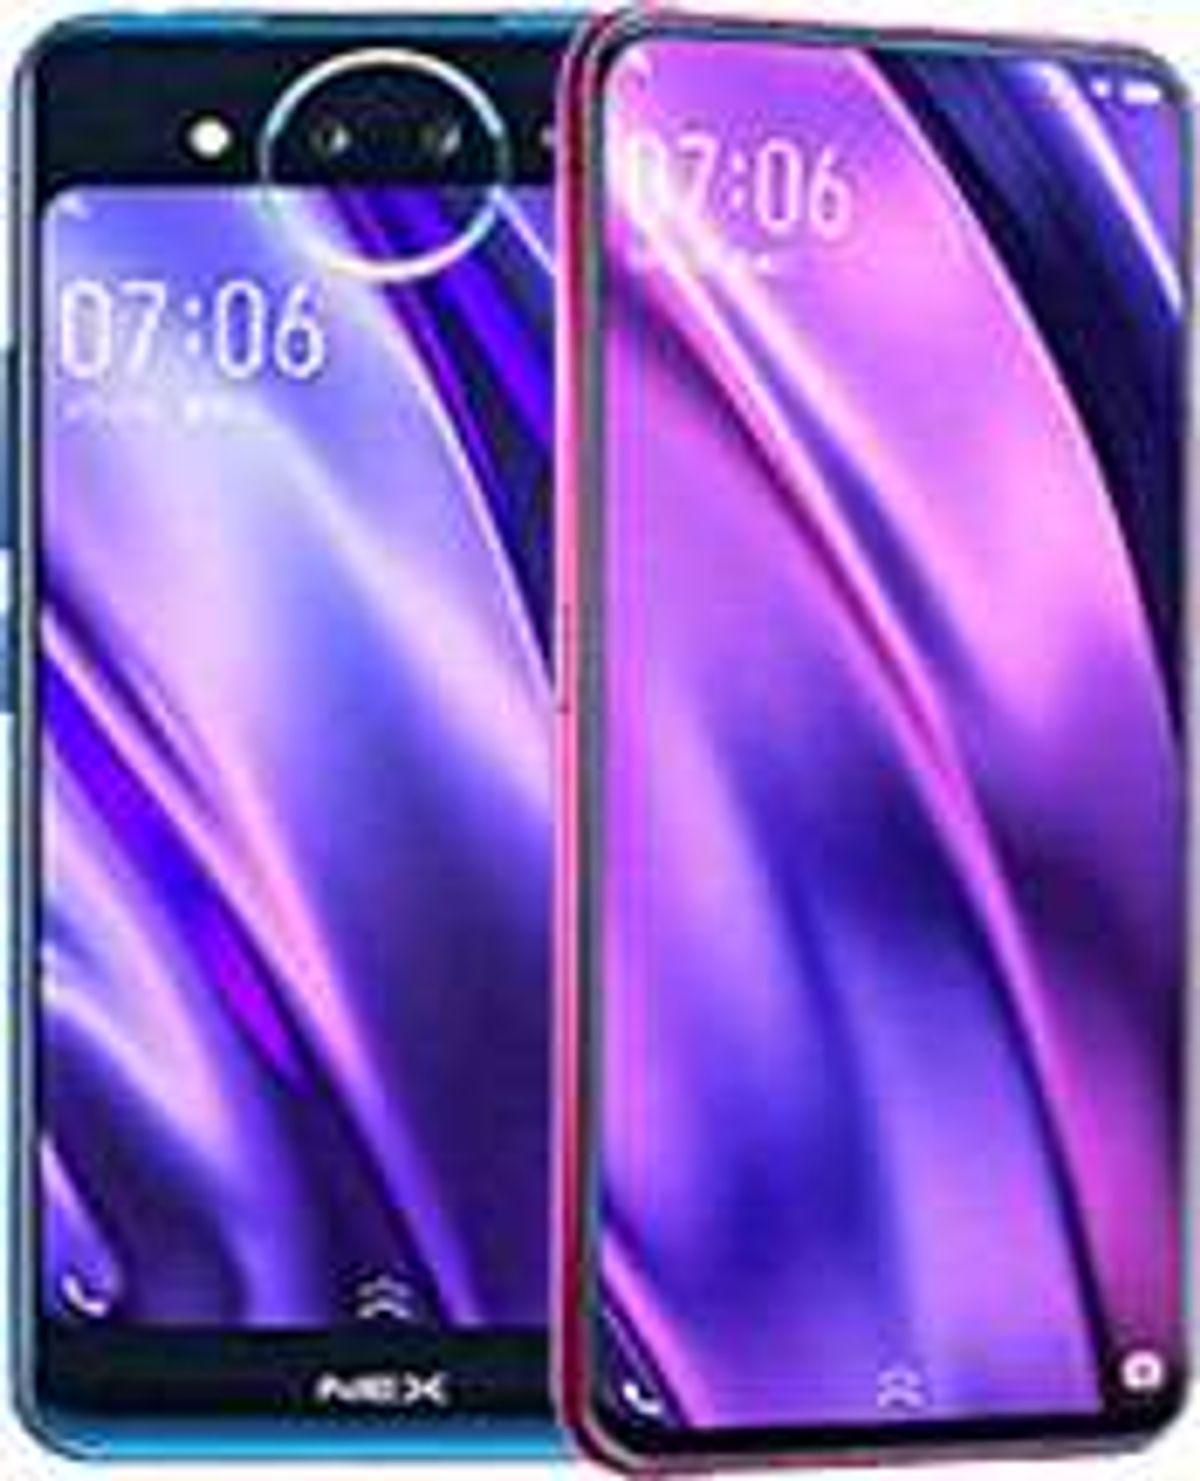 Best 10 GB RAM Mobiles Phones in India - August 2019 | Digit in